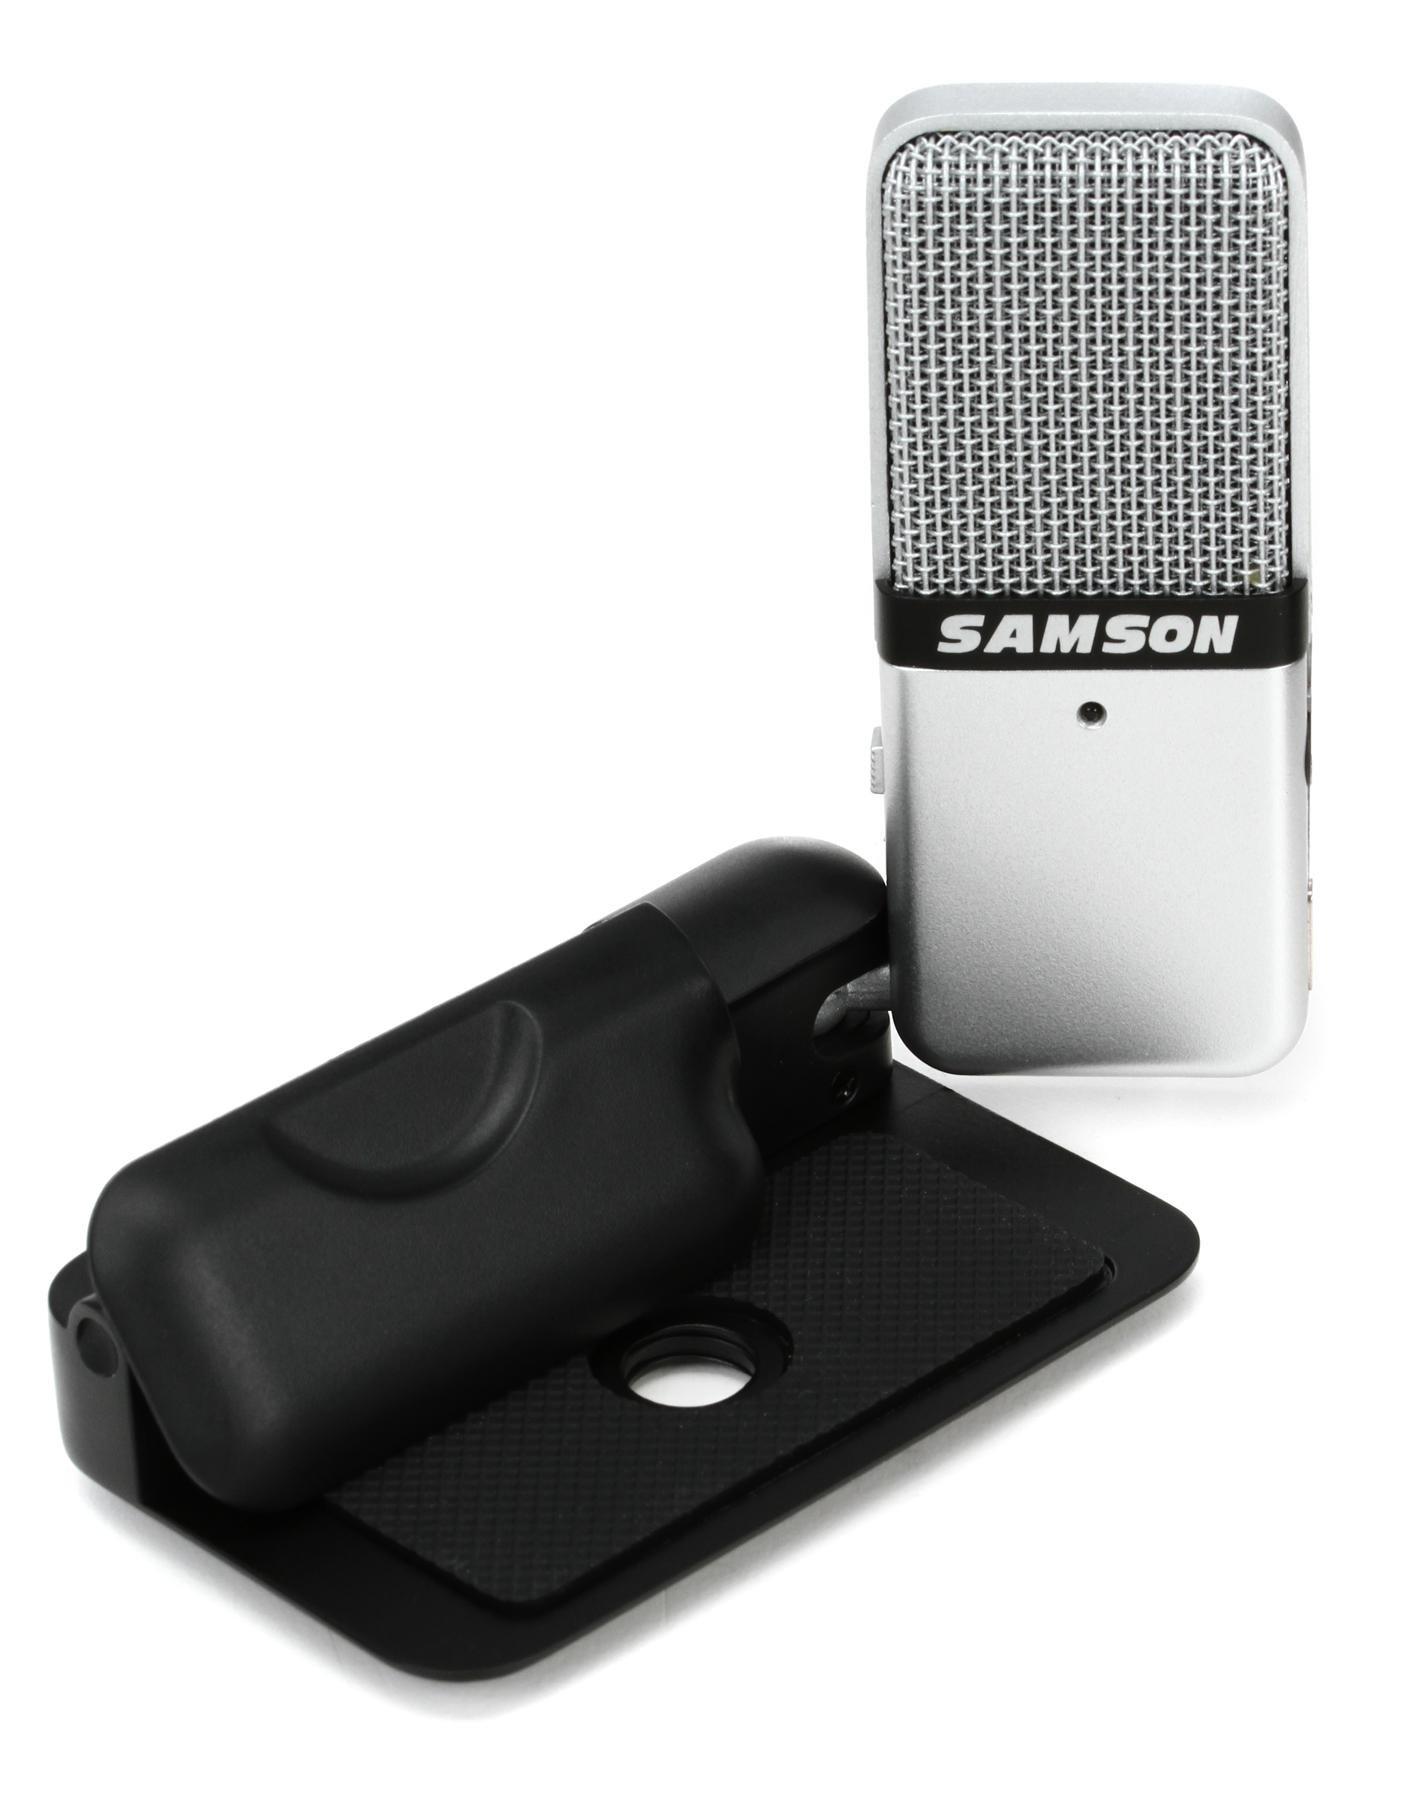 Samson Go Mic Portable USB Condenser Microphone | Sweetwater